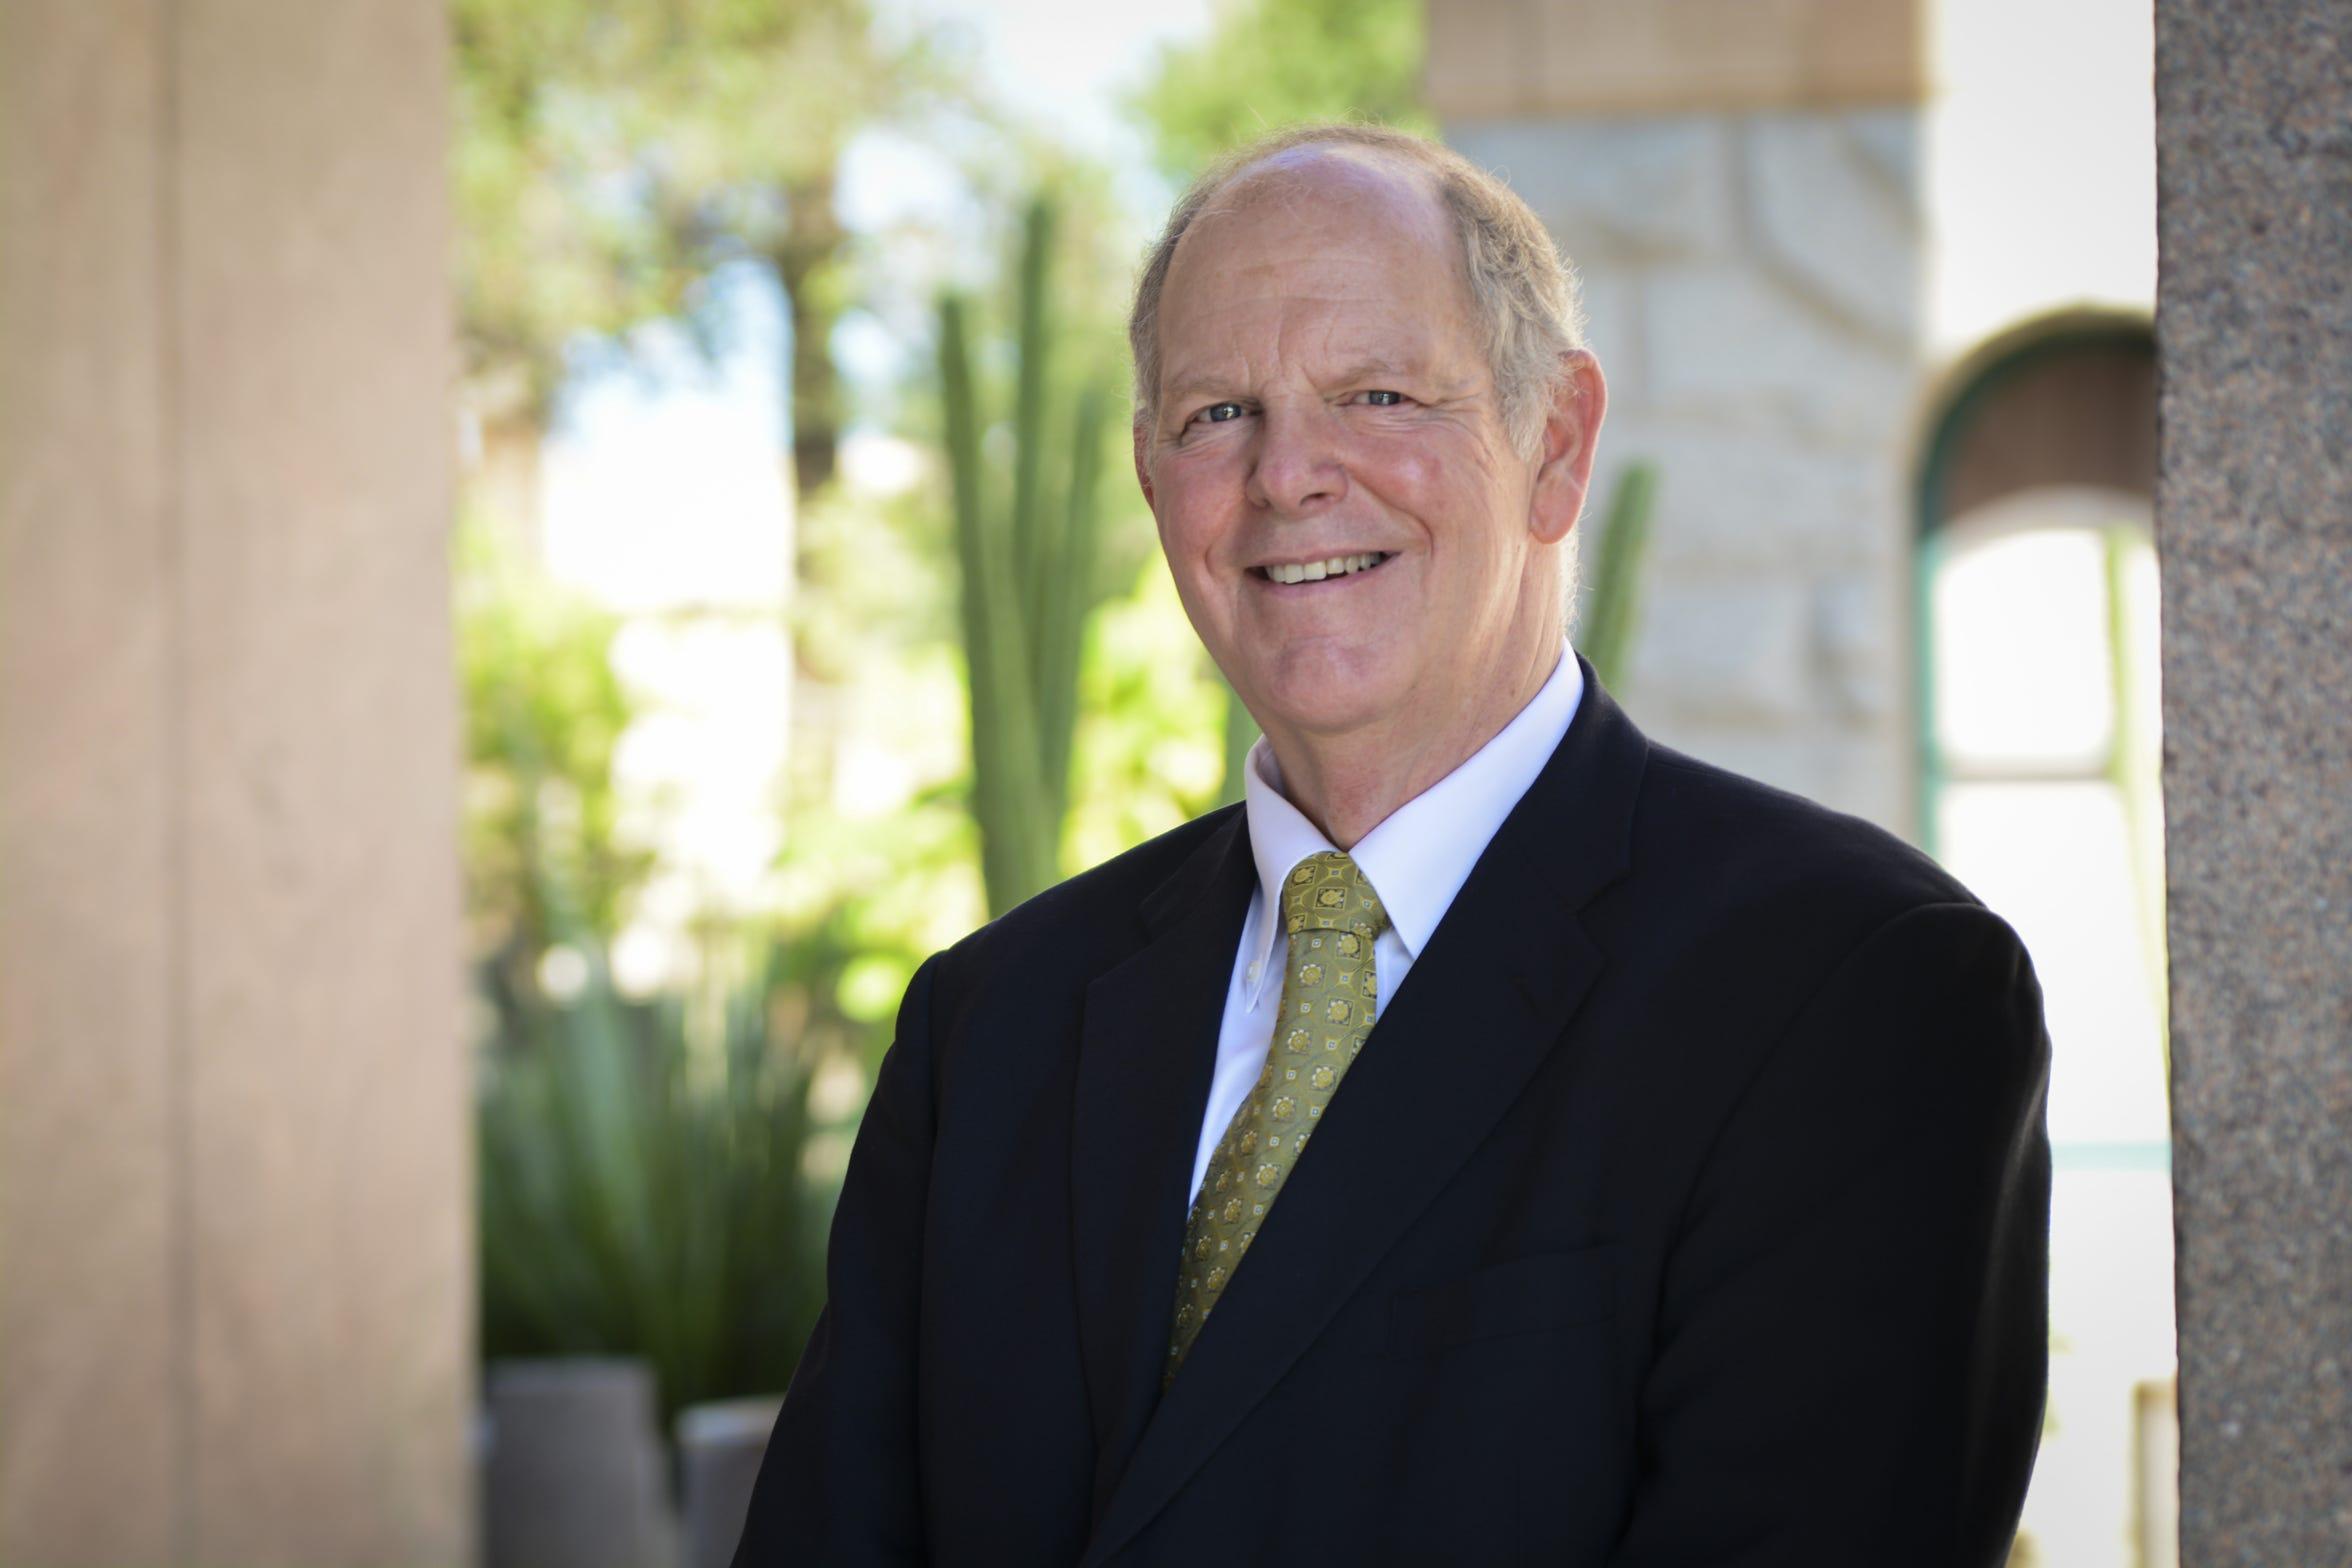 U.S. Rep. Tom O'Halleran